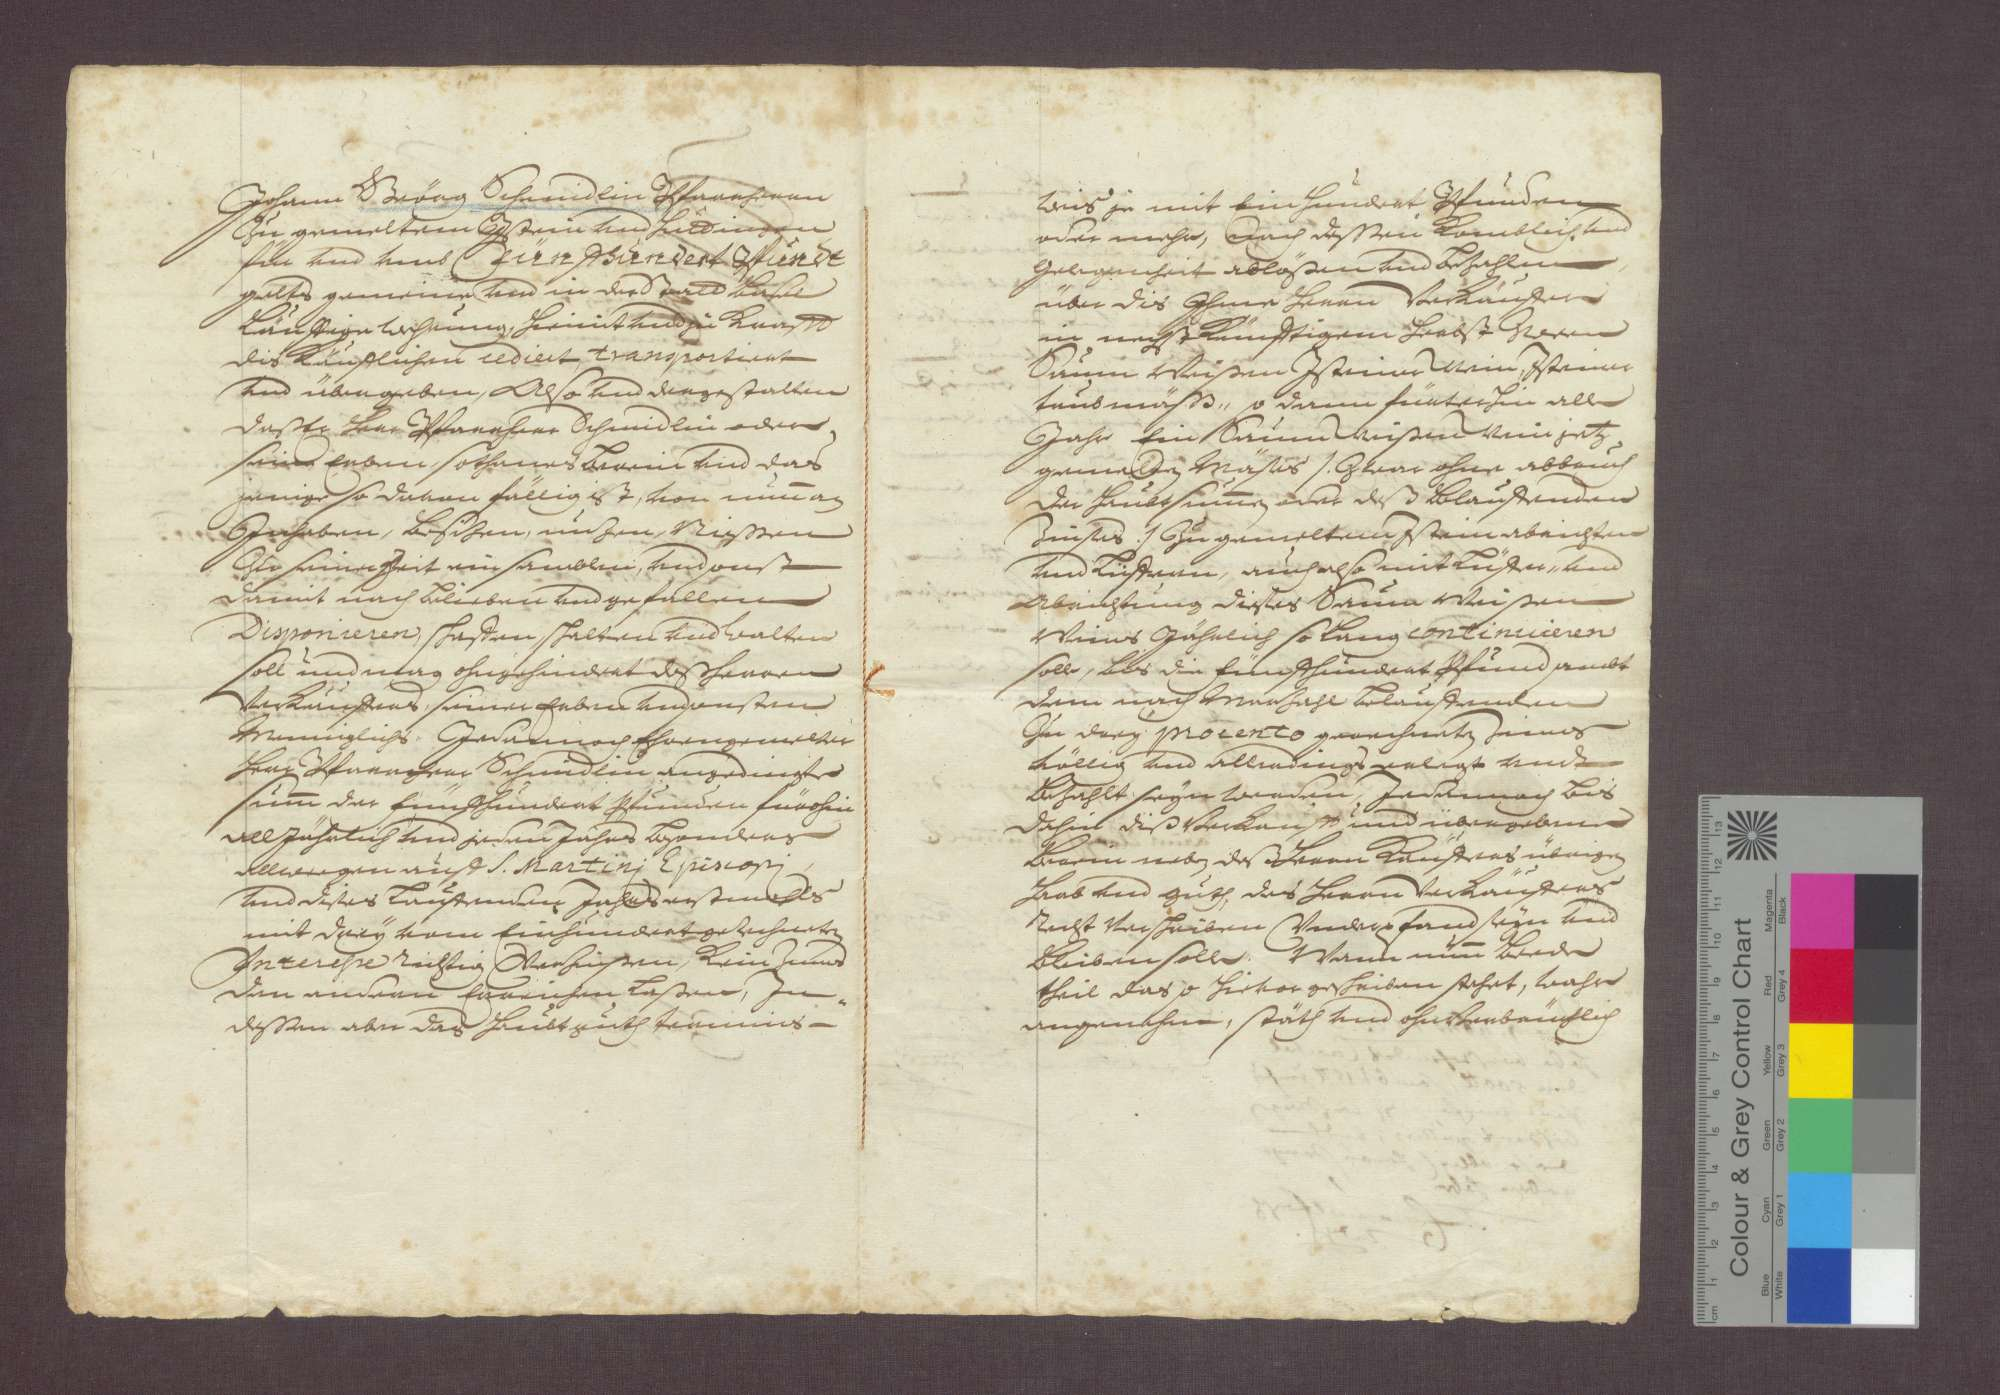 Emanuel Fasch, Waagmeister in Basel, verkauft einen Zehnt zu Istein an den Pfarrer Johann Georg Schmidlin in Istein., Bild 3